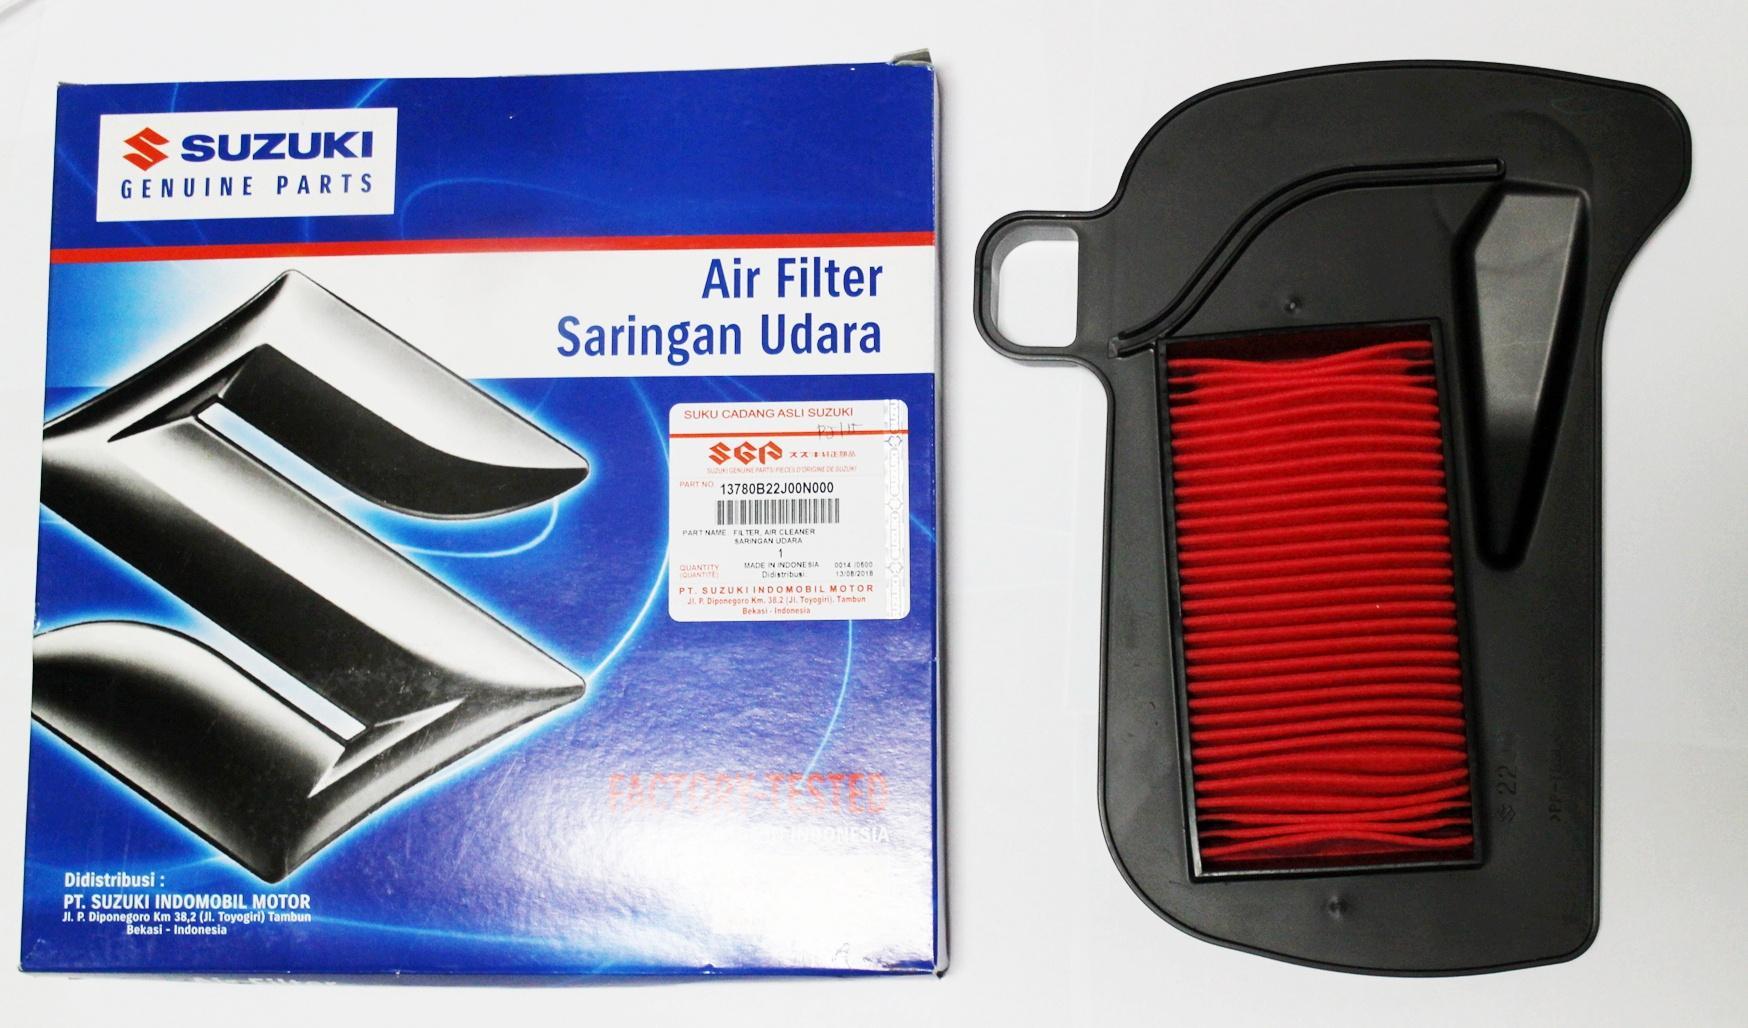 ORIGINAL SUZUKI AIR CLEANER/FILTER FOR RAIDER J 115 F I